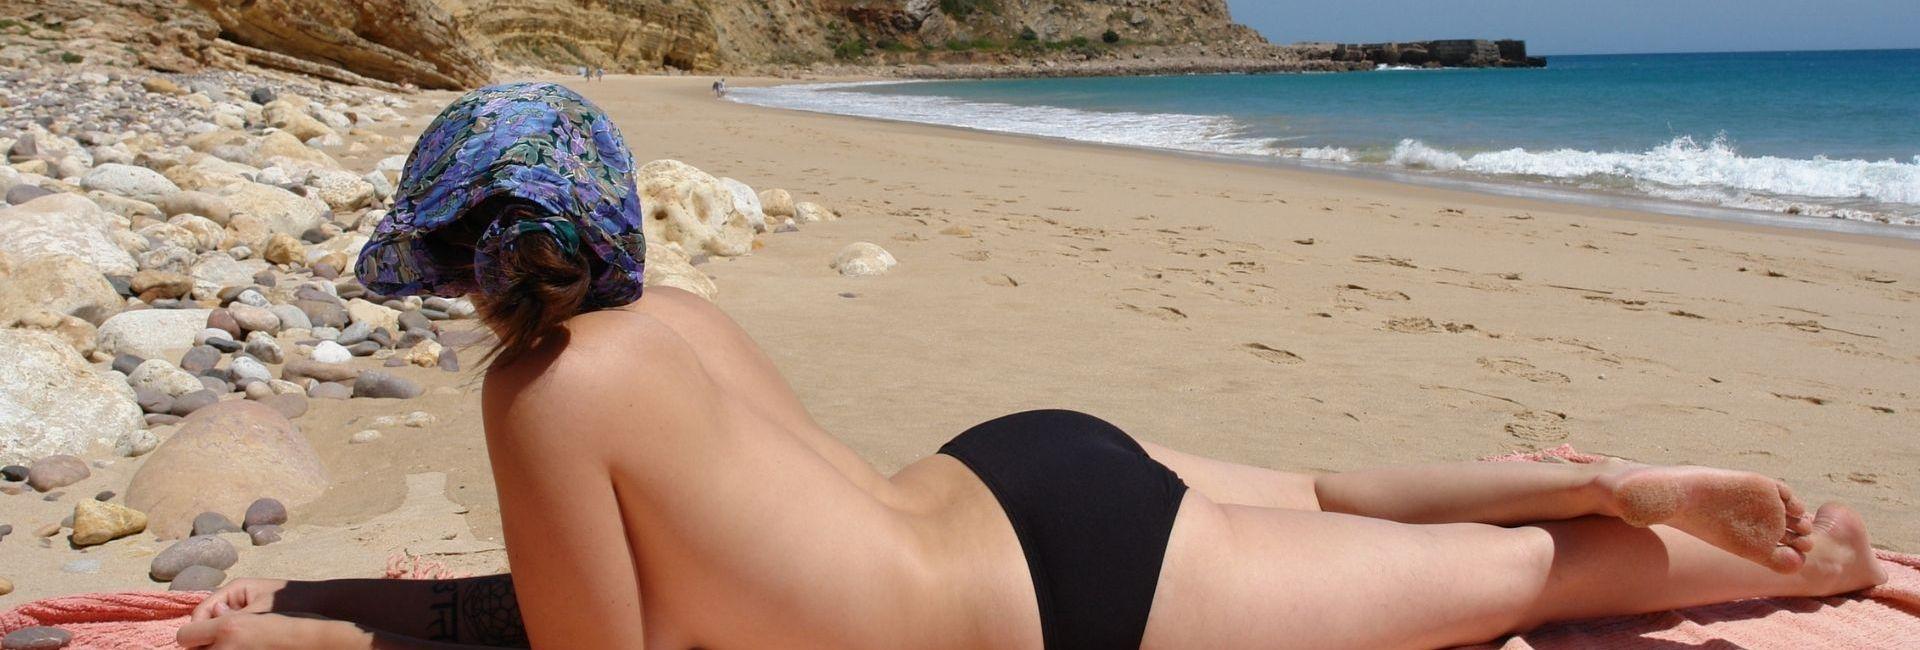 Toplesswoman,_Burgau,_Portugal